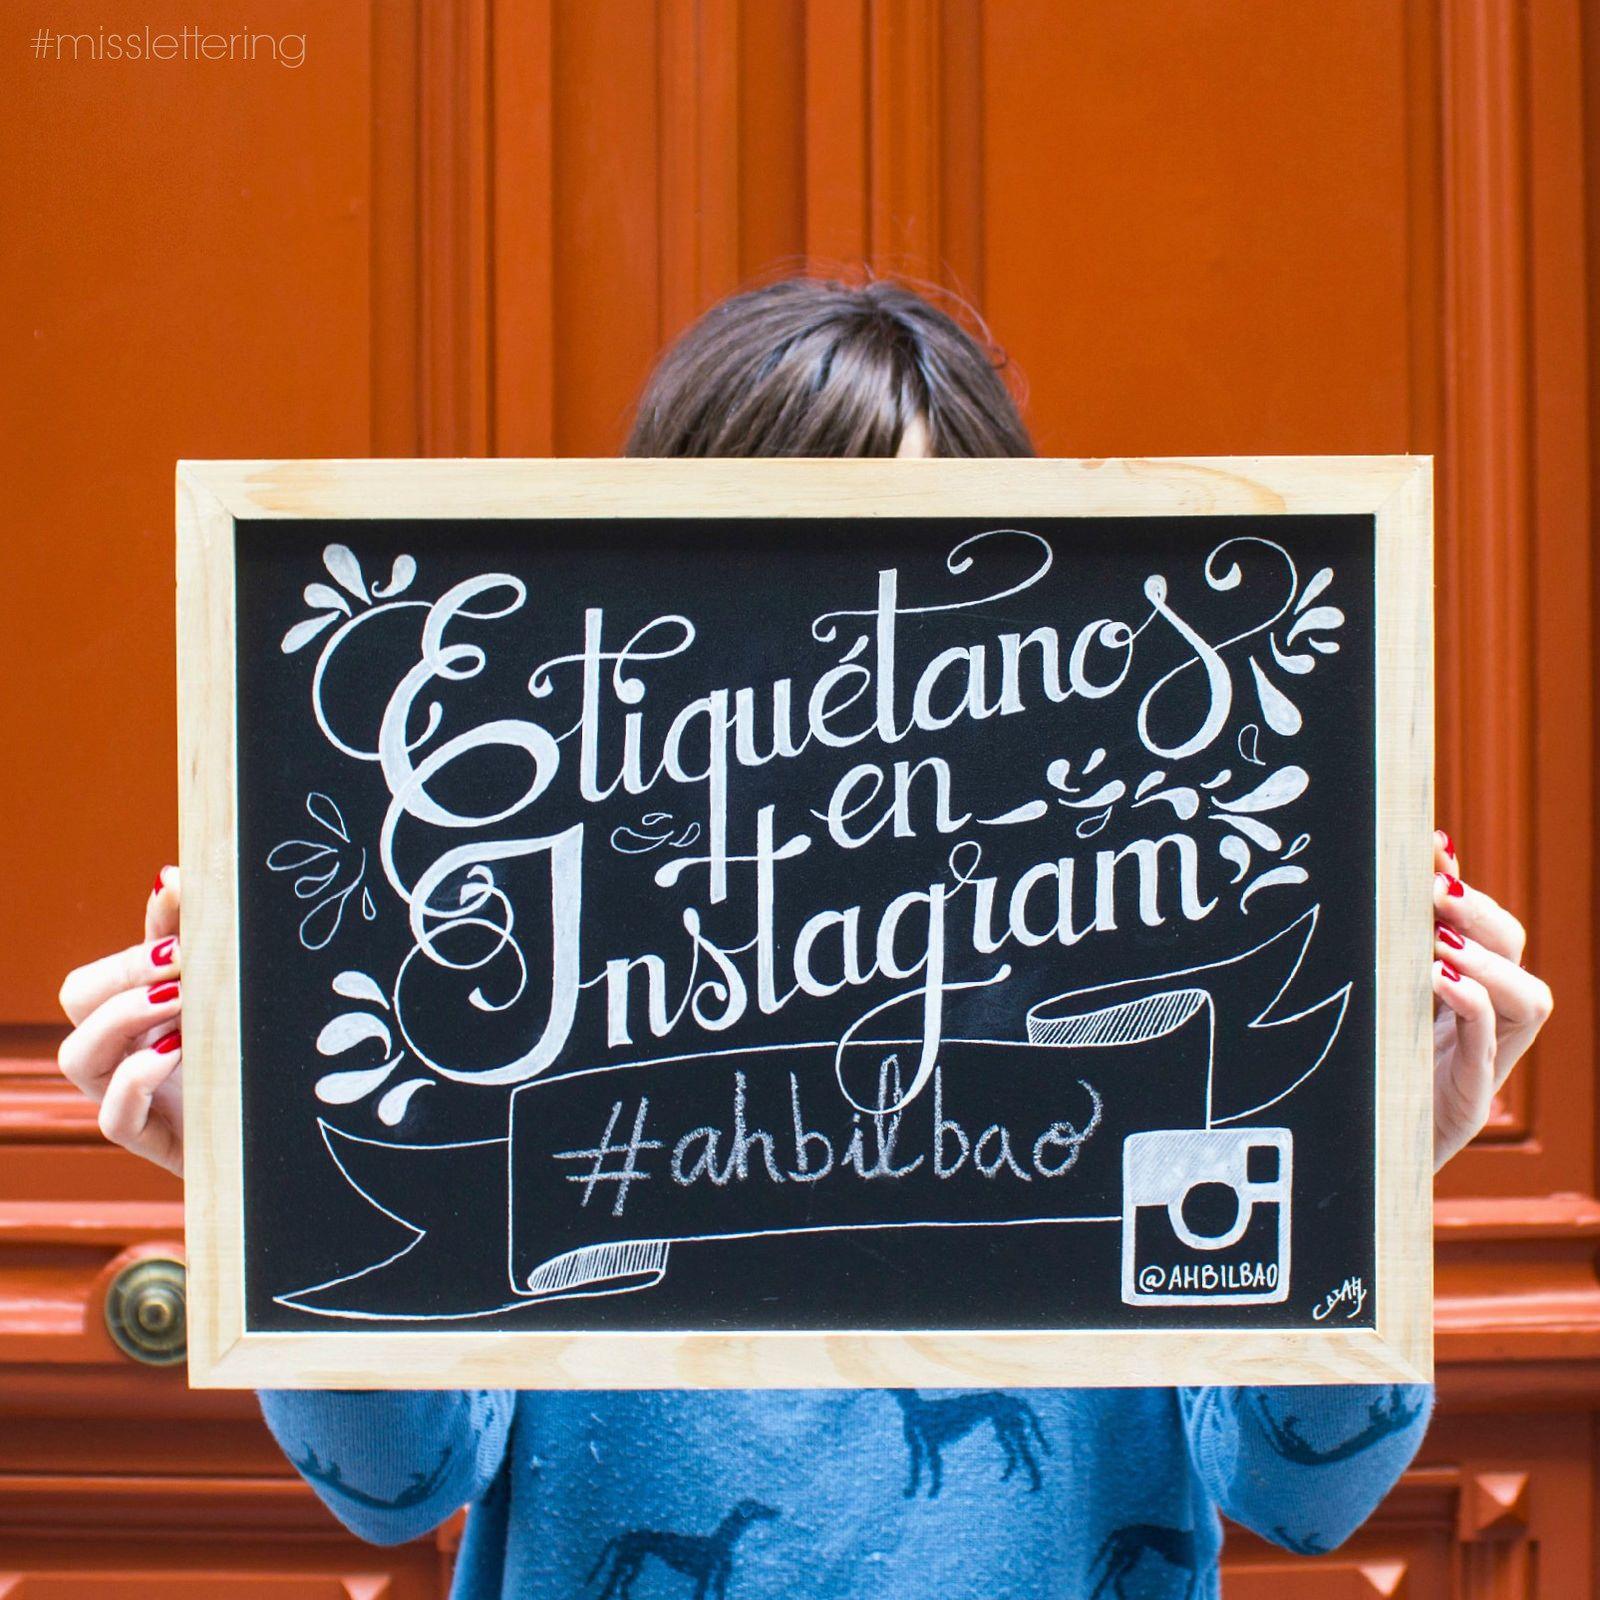 | Etiquétanos en Instagram | Diseño de lettering sobre pizarra personalizable.